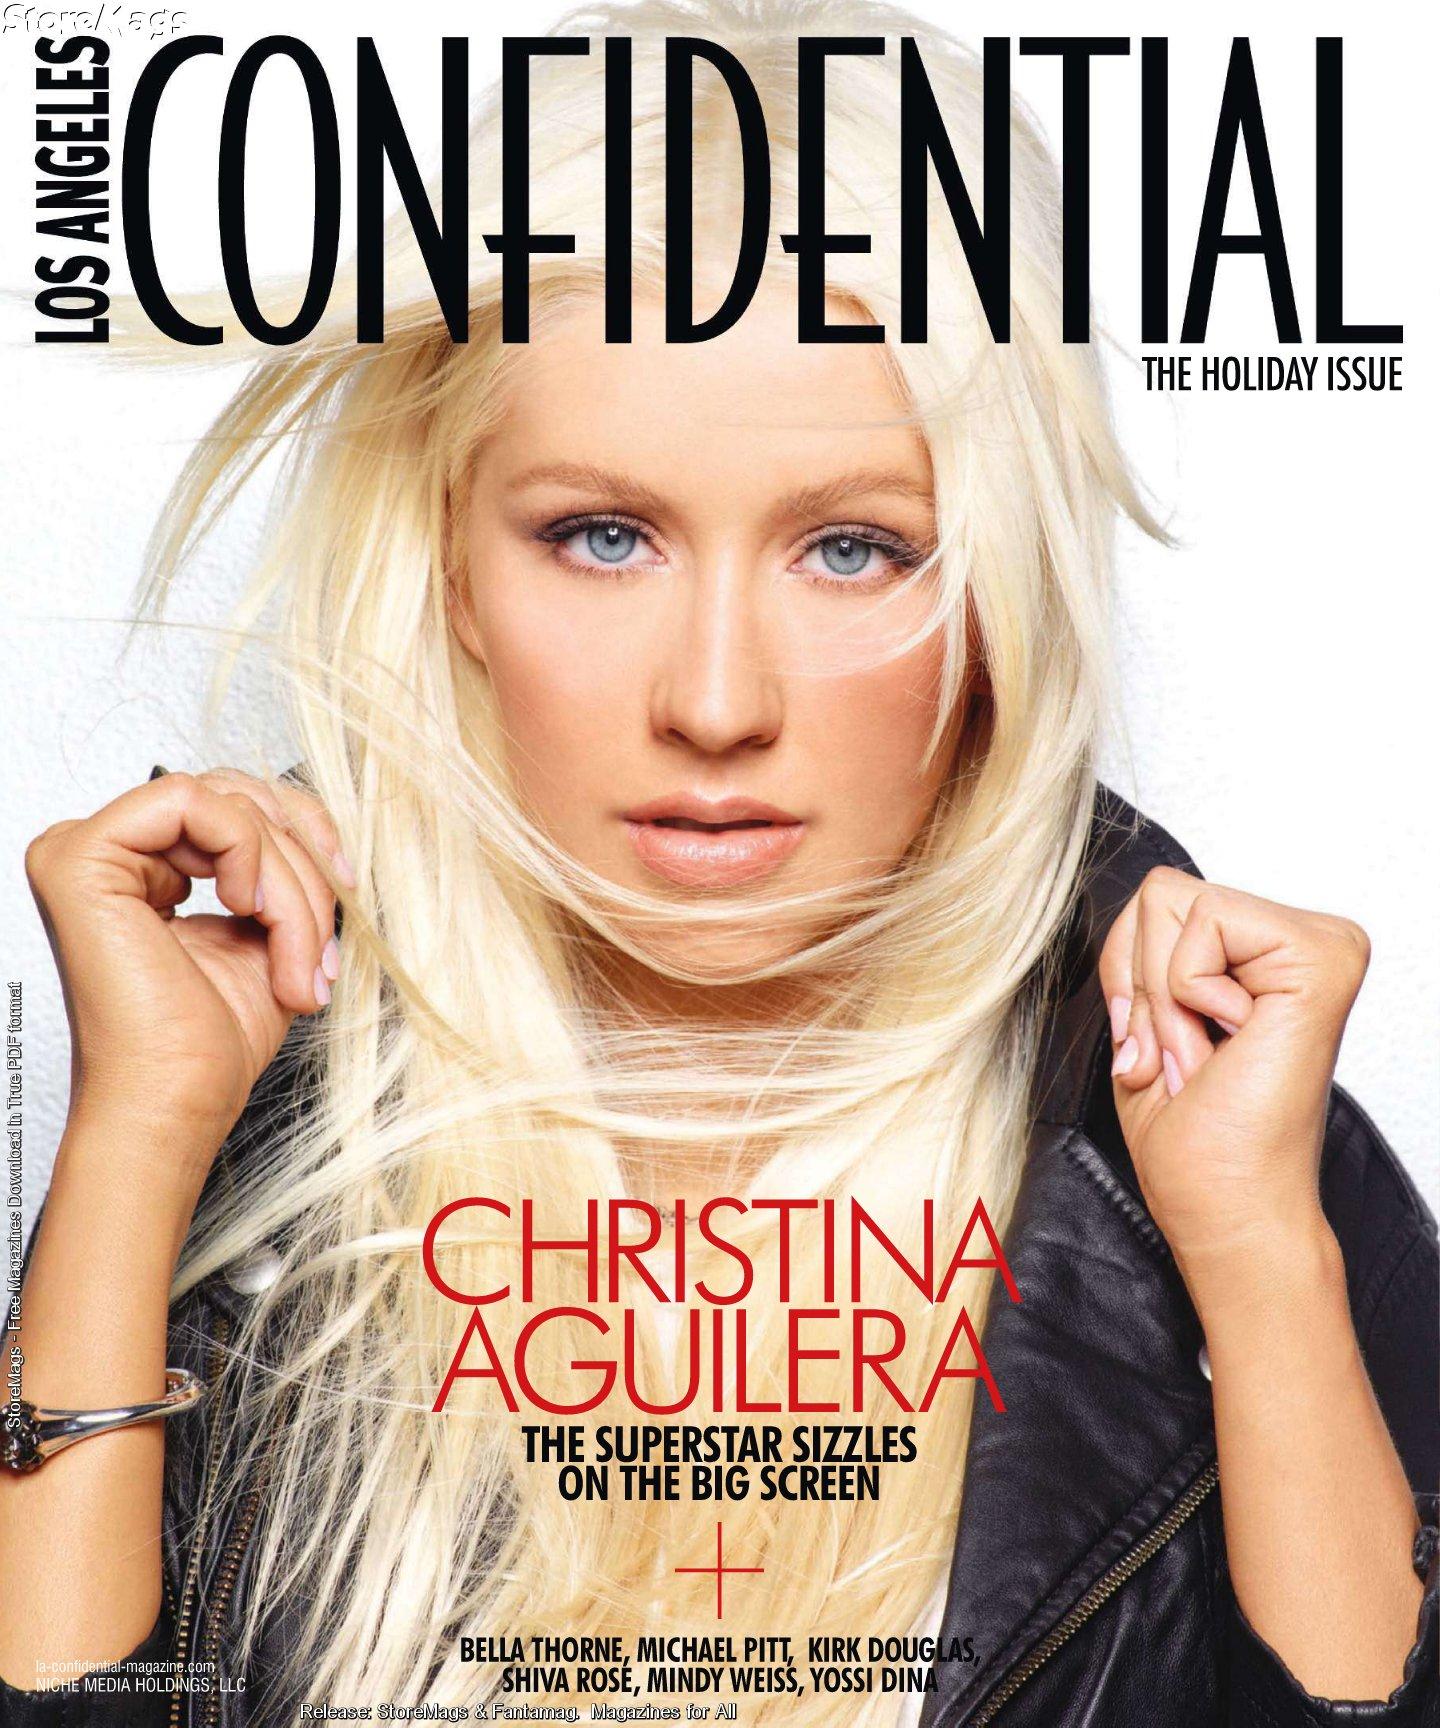 00274_ChristinaAguilera_LosAngelesConfidential_December_2010_1_122_499lo.jpg